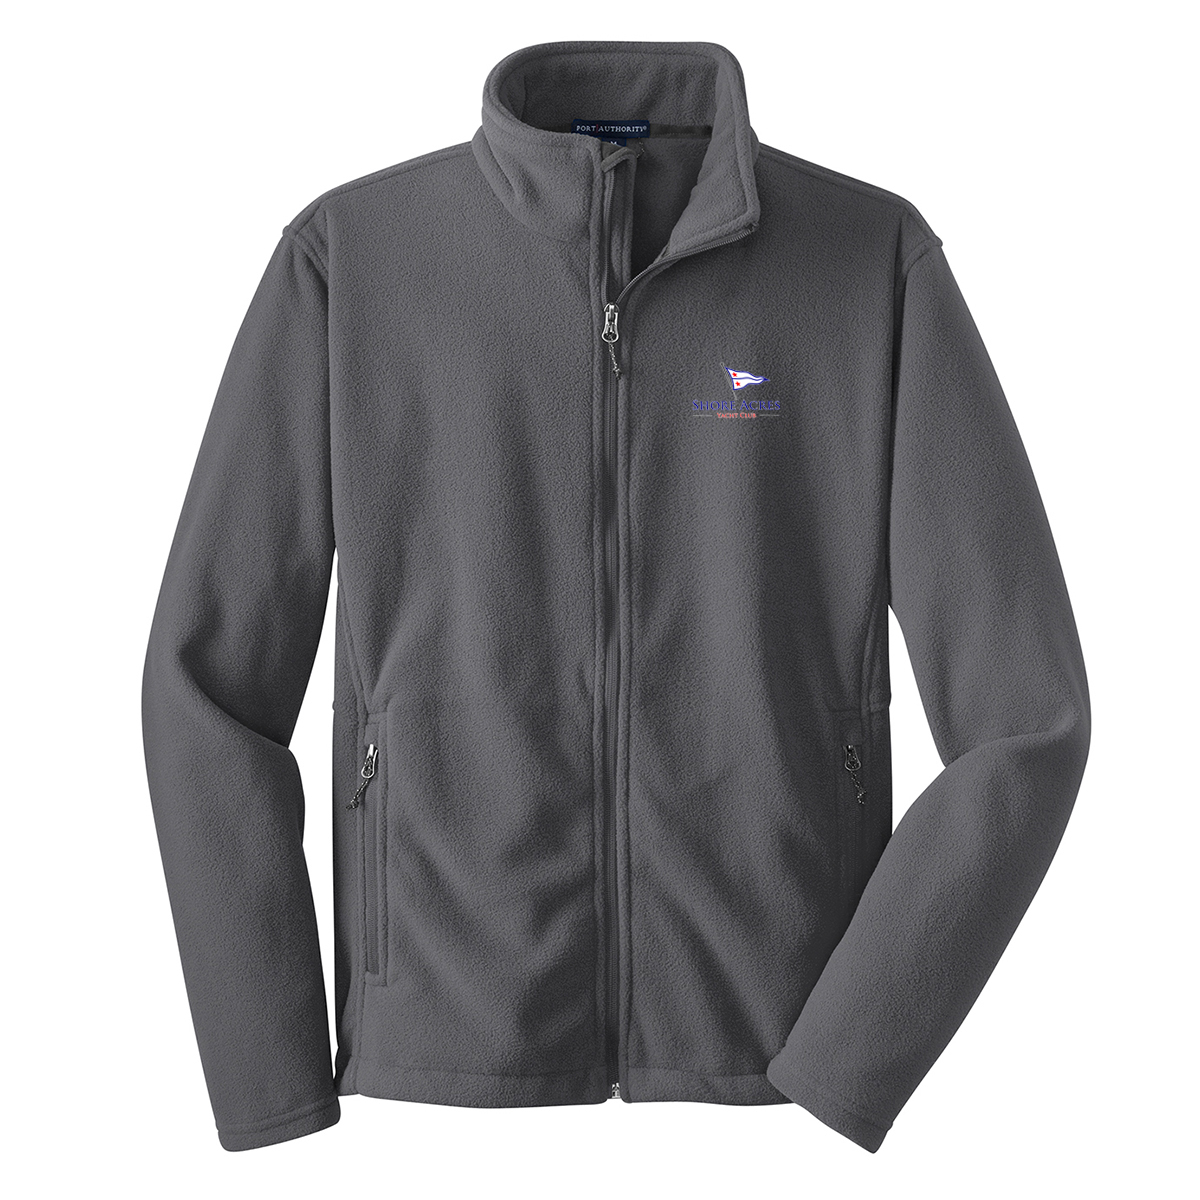 Shore Acres Yacht Club - Youth Value Fleece Jacket (SAYC503)